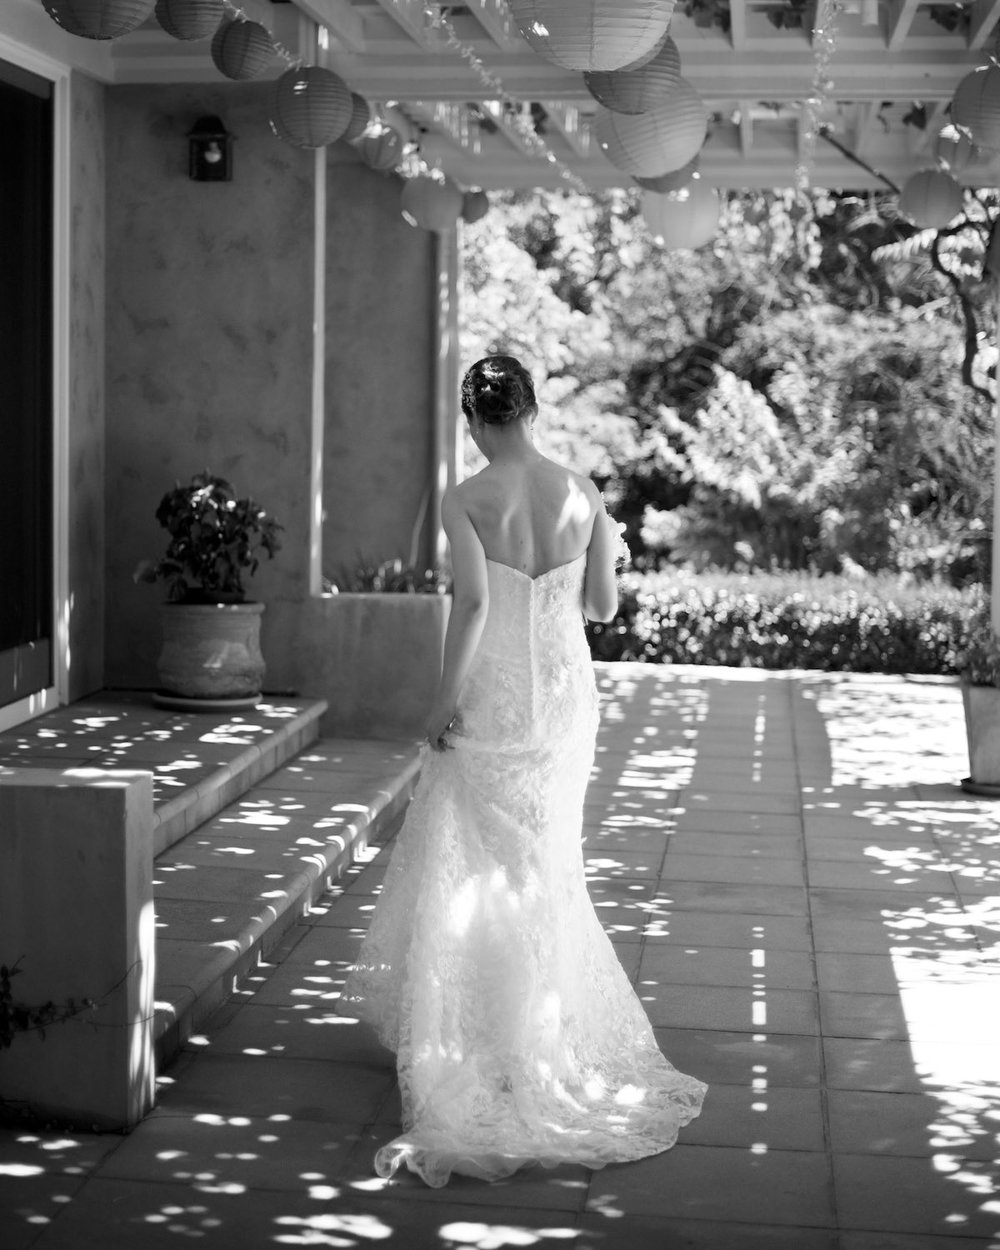 napa-wedding-michal-pfeil-20.jpg